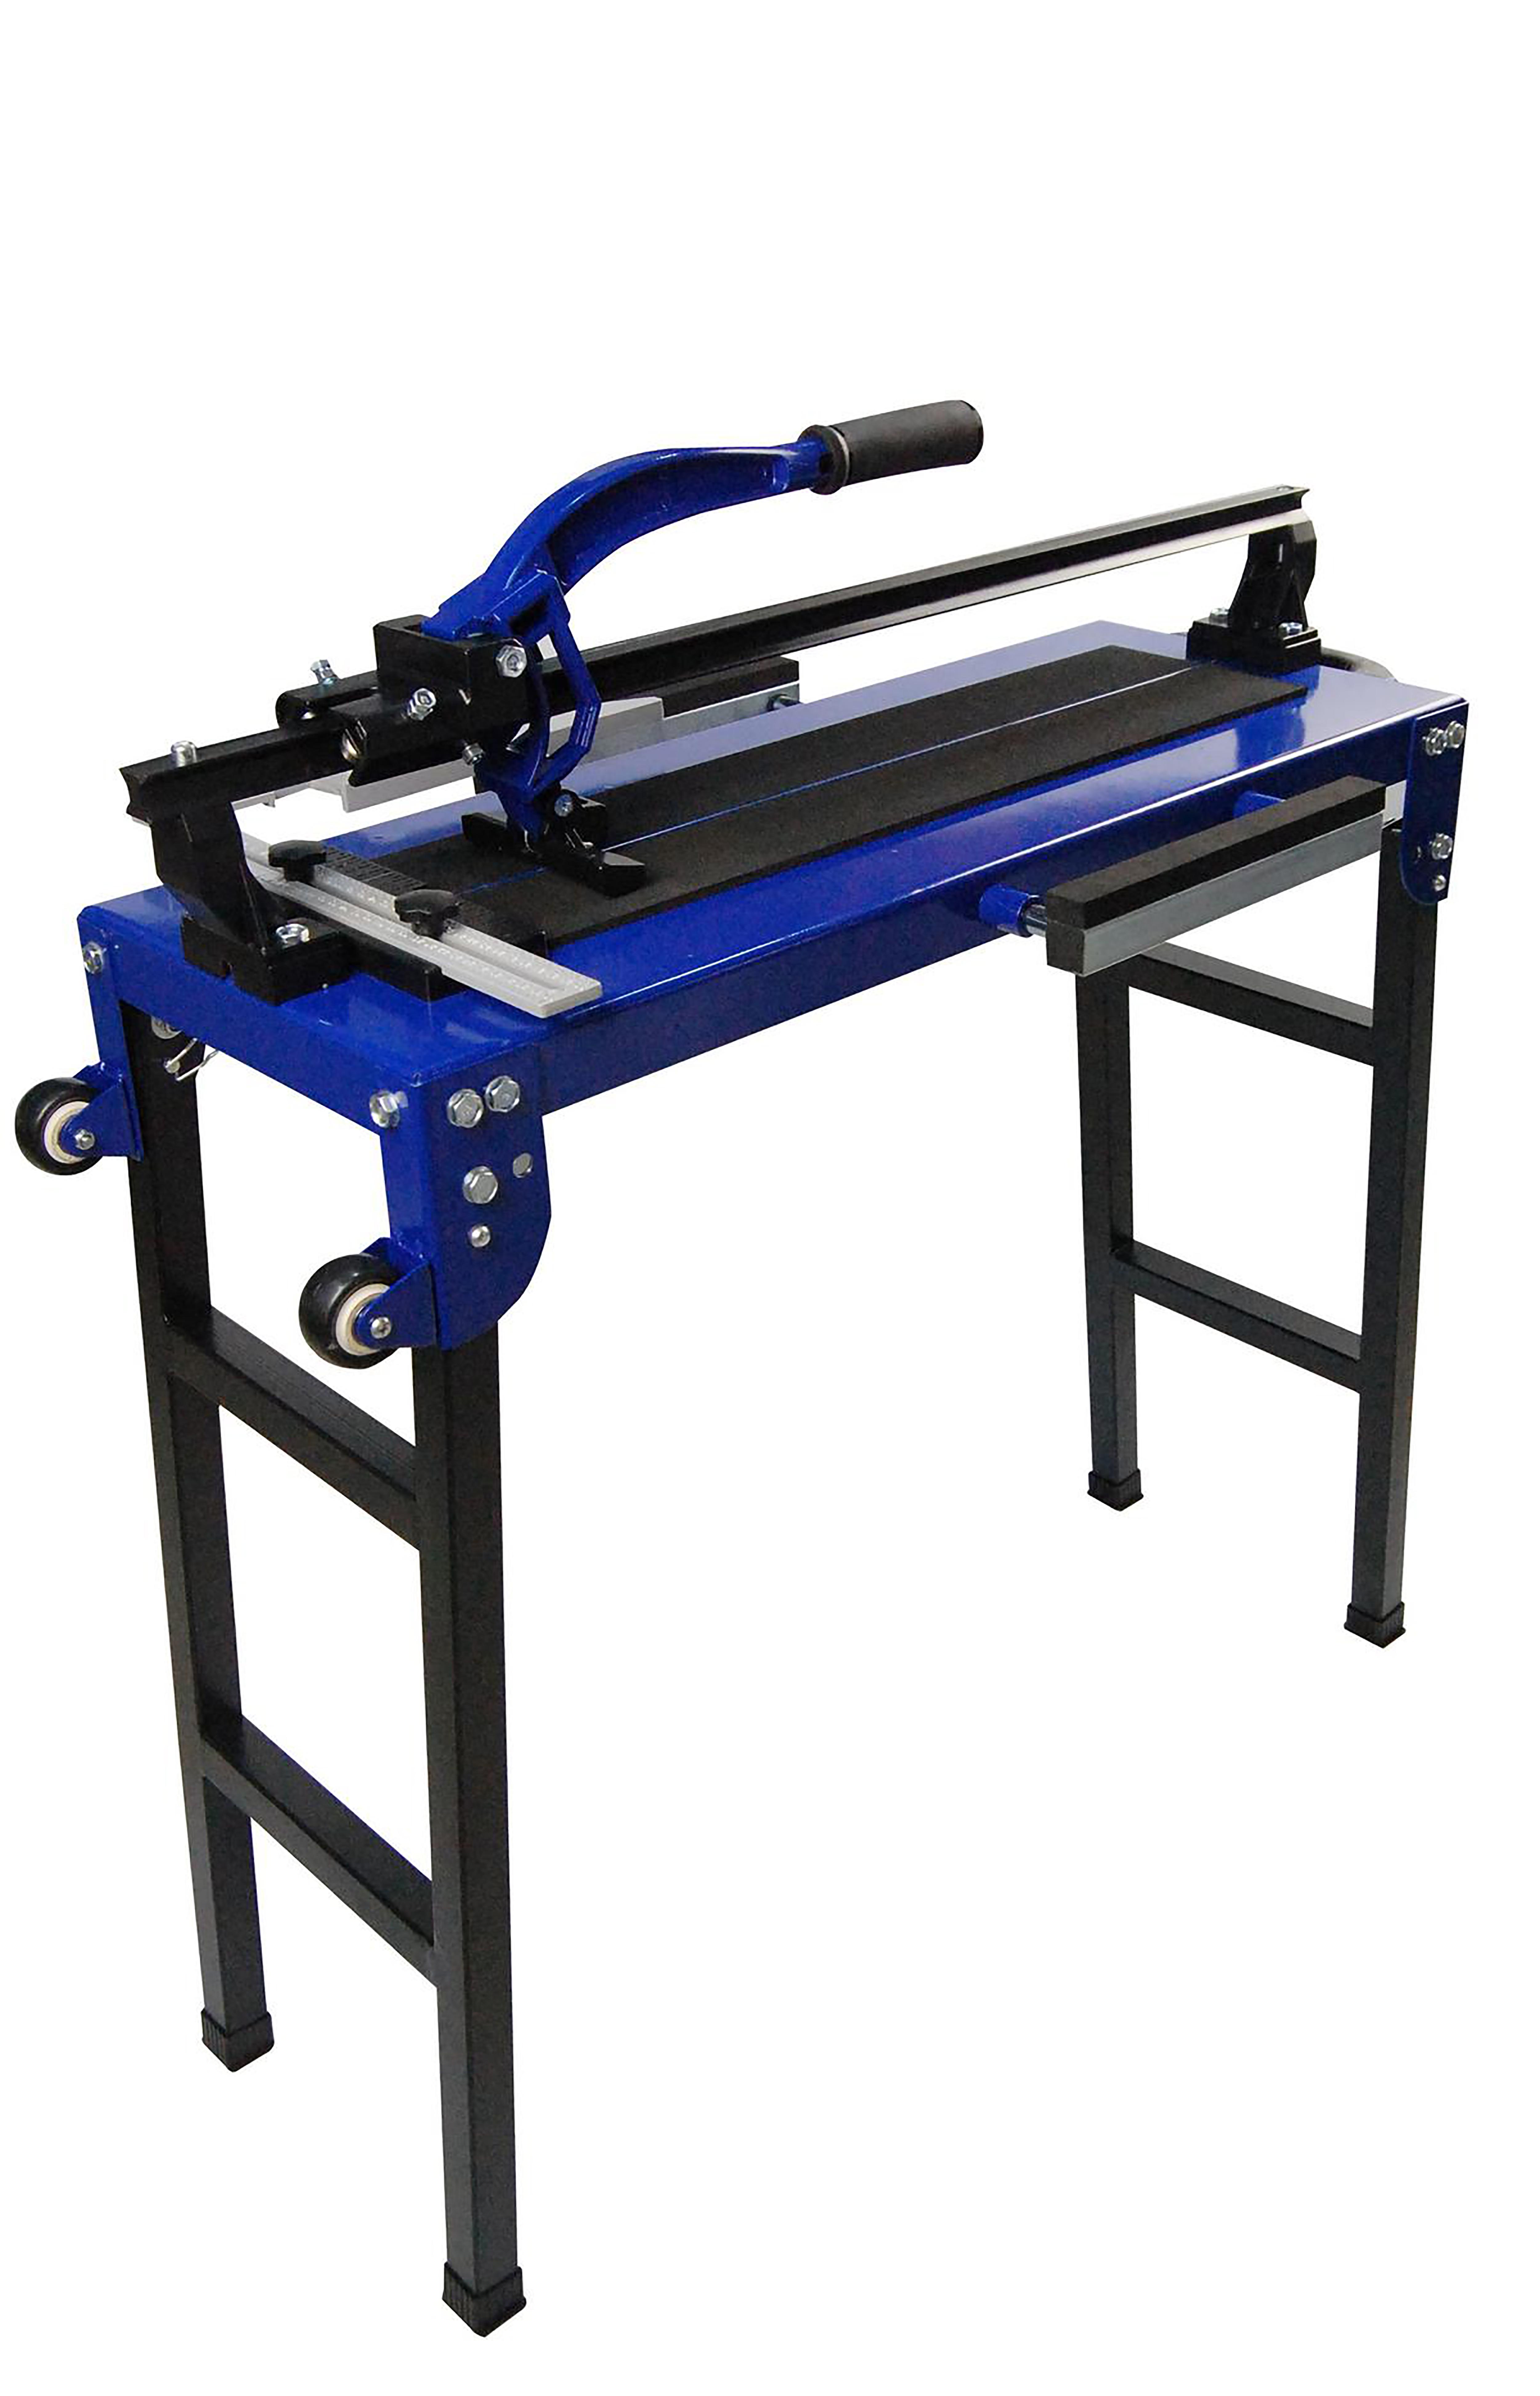 Freestanding 600mm Manual Tile Cutter - Vitrex